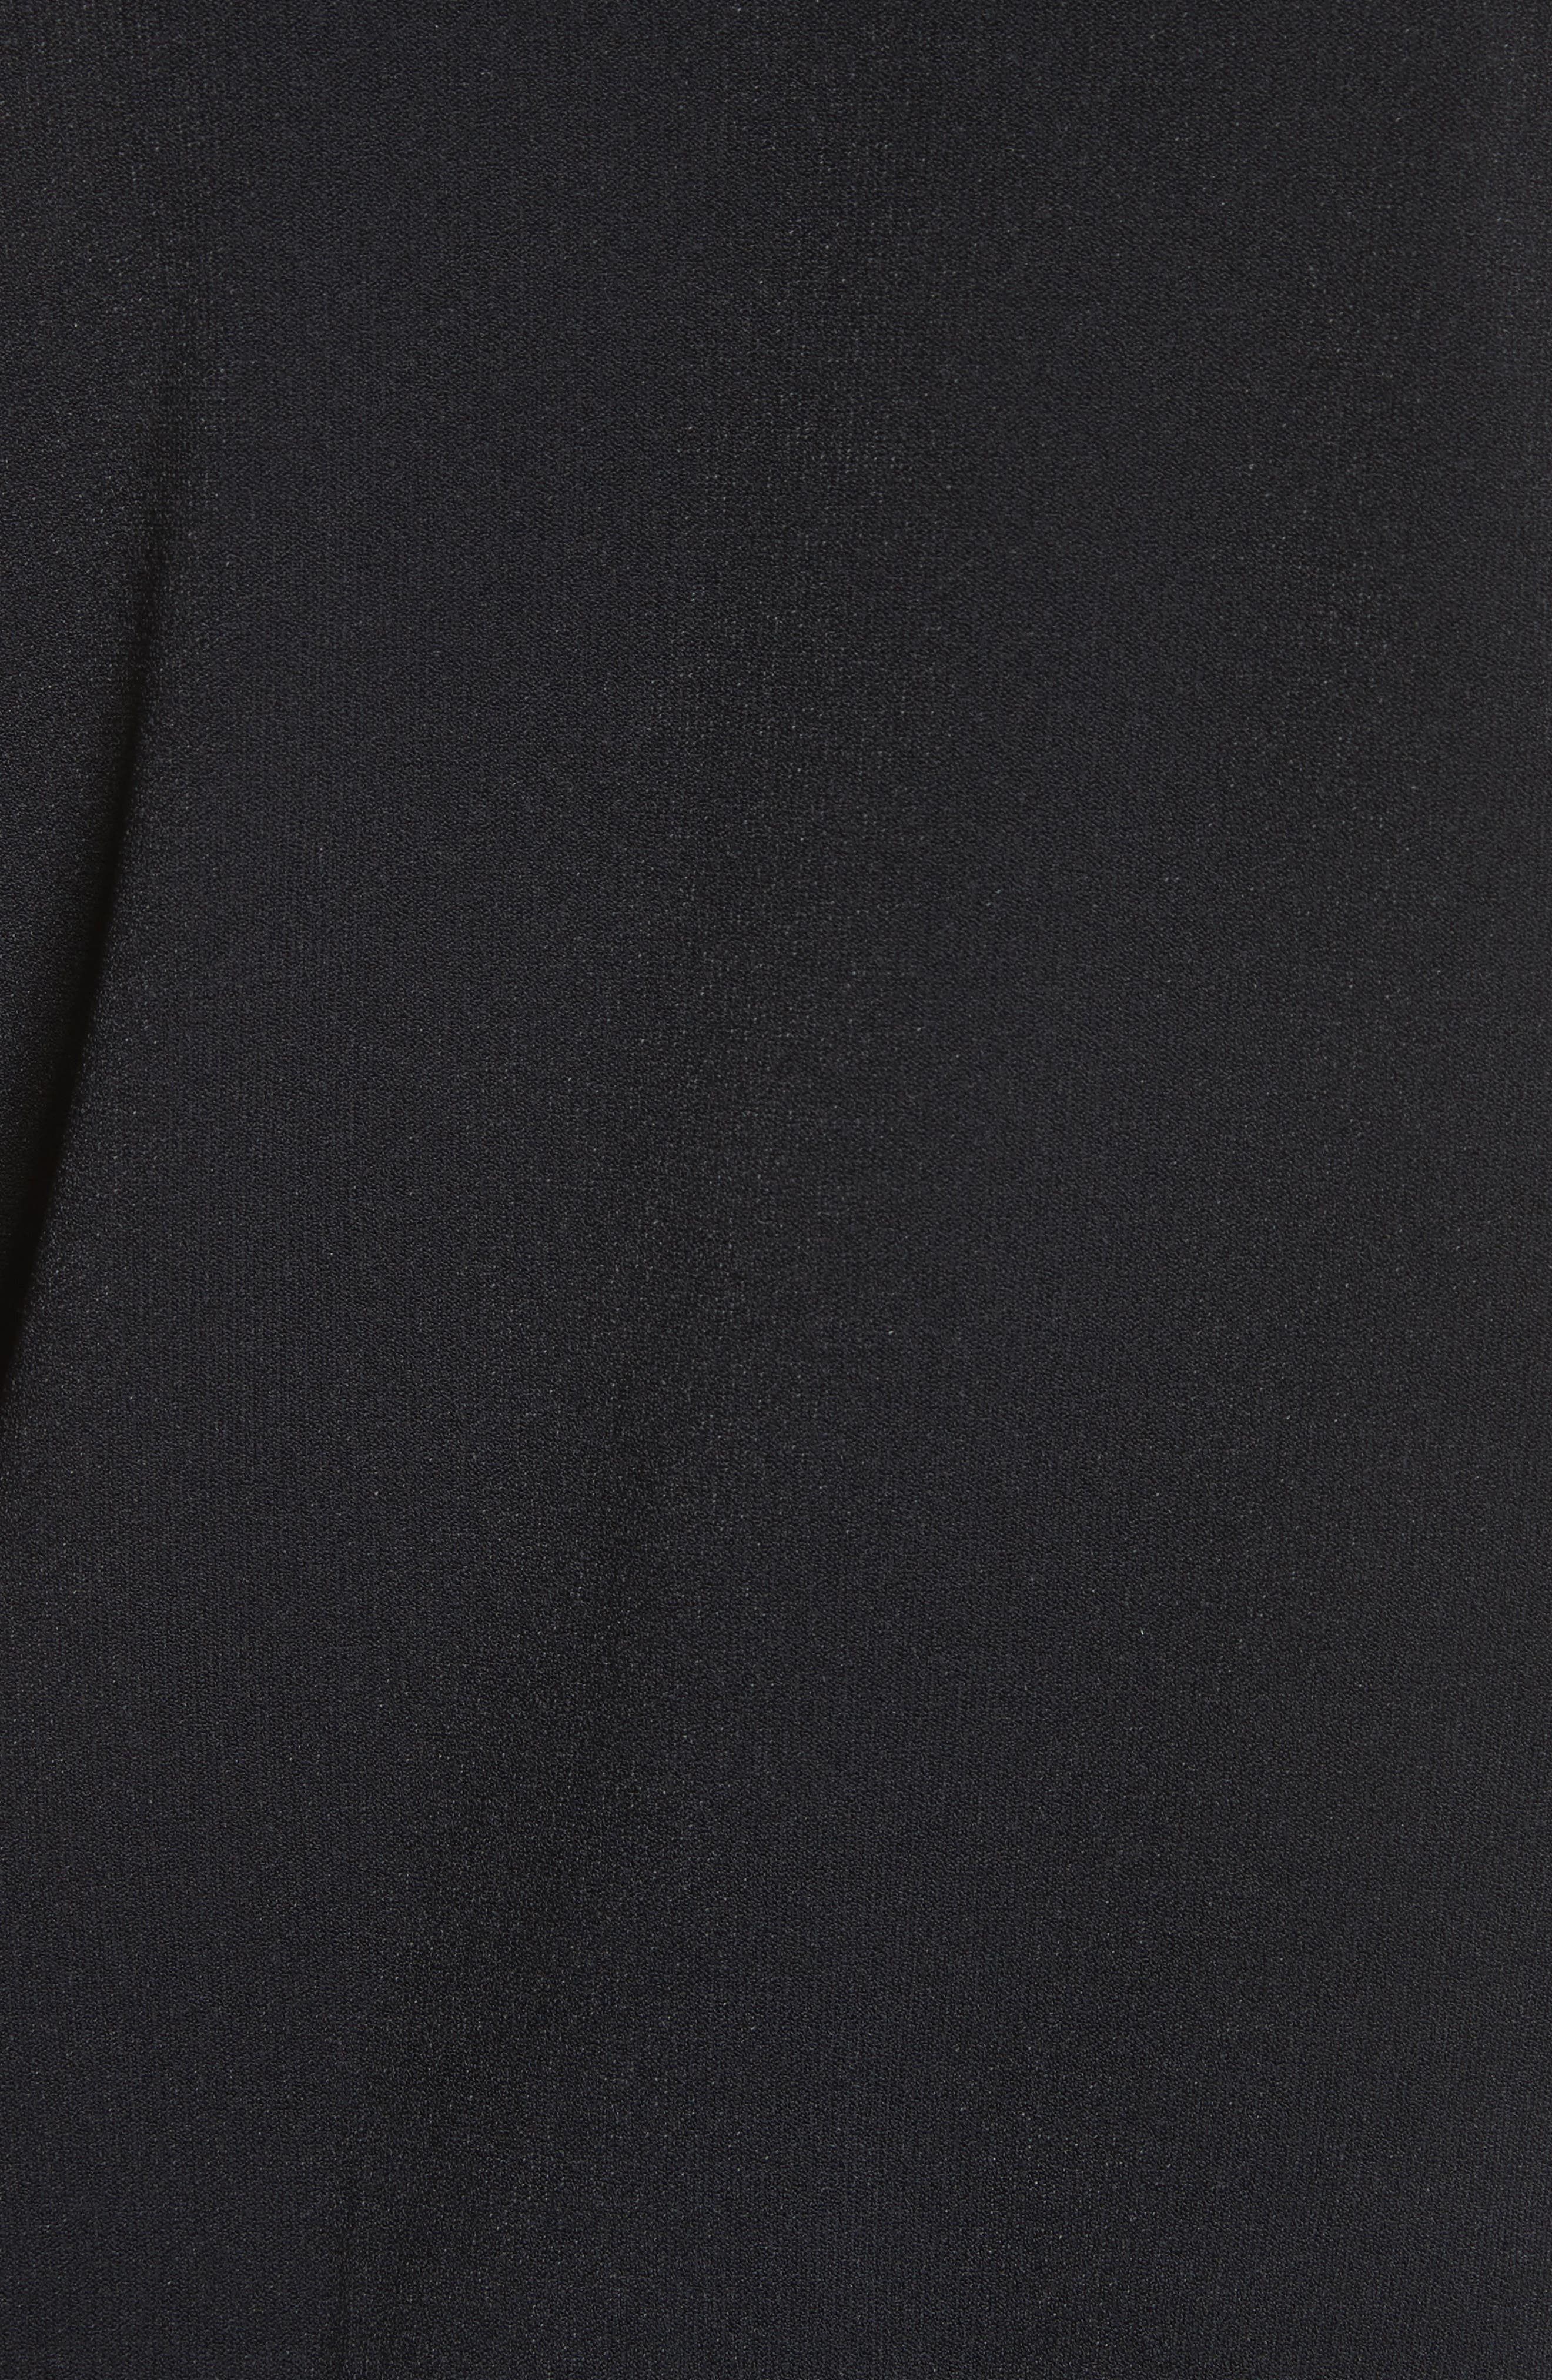 Lace Front Bomber Jacket,                             Alternate thumbnail 5, color,                             Black